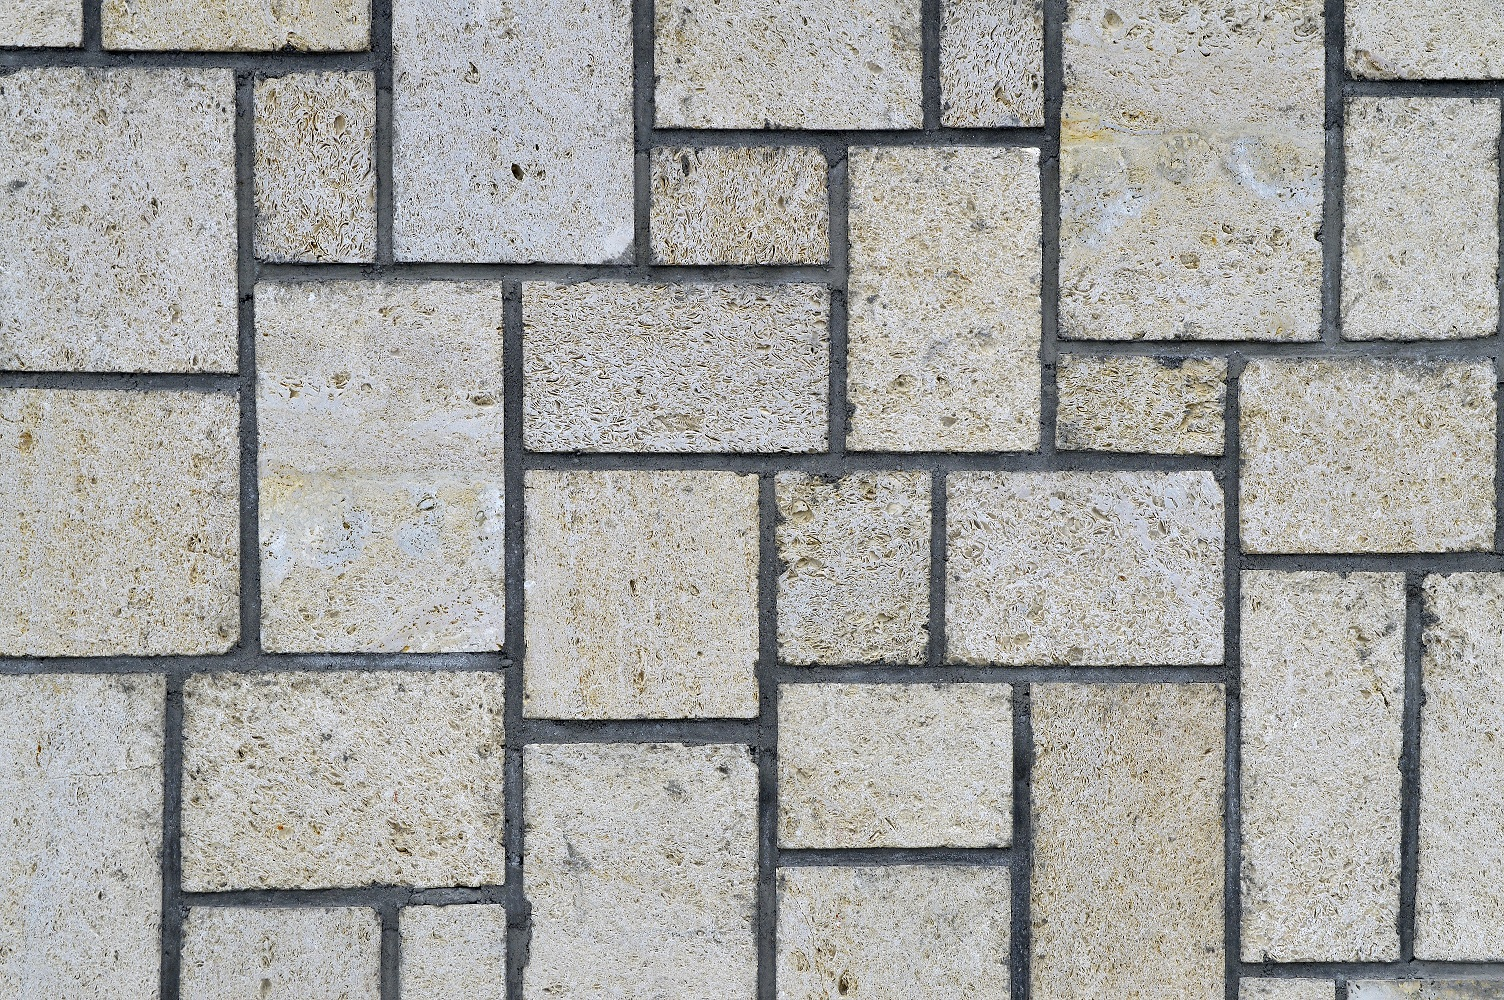 free stock photos - designtnt-textures-bricks-set-2-13